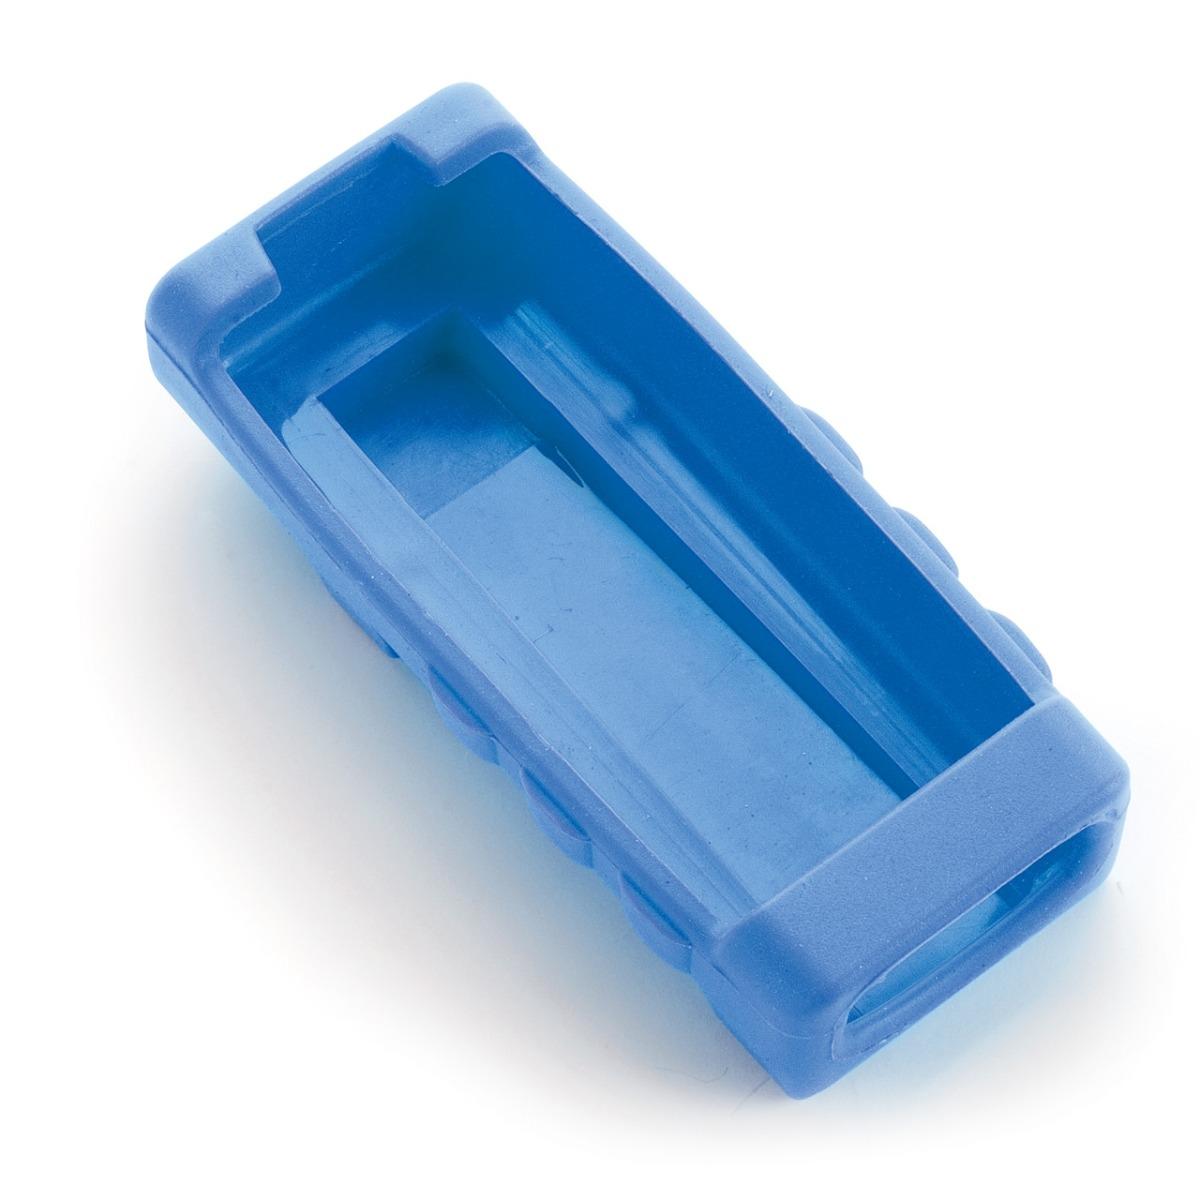 Funda de Goma a Prueba de Golpes (Azul) - HI710024